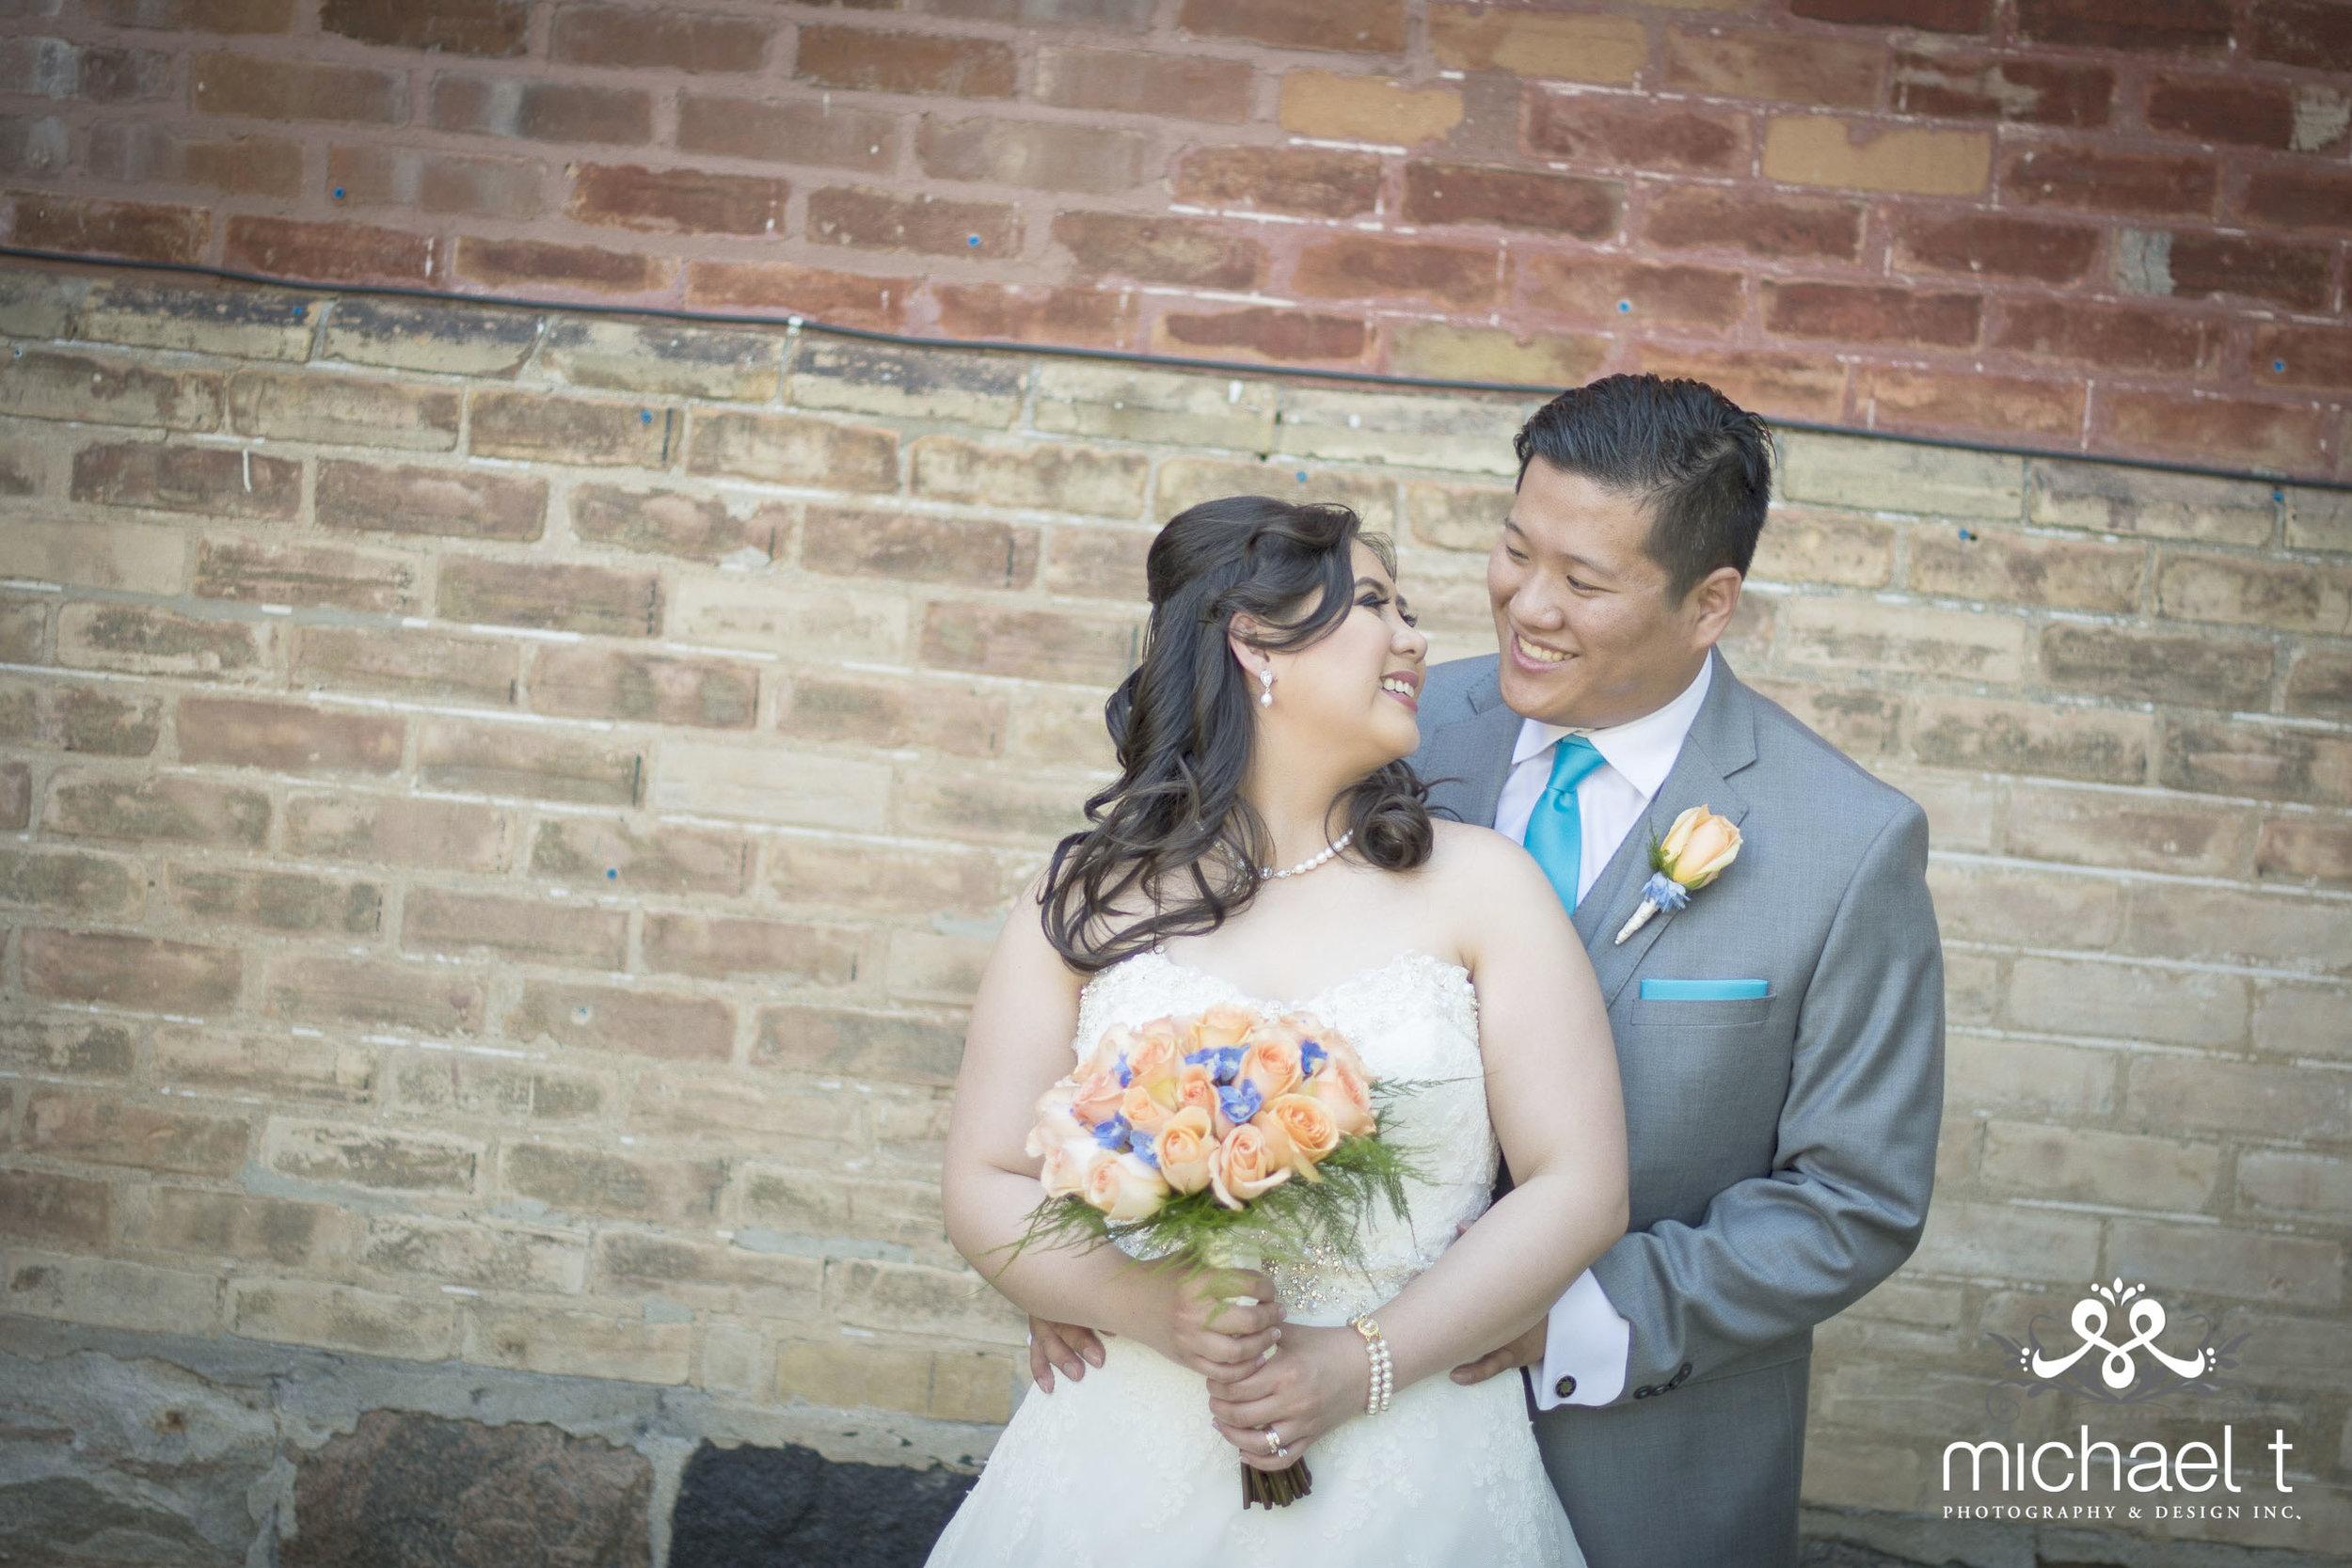 Marie Kei & Brian - June 17, 2016 // Photographer:Michael T. Photography